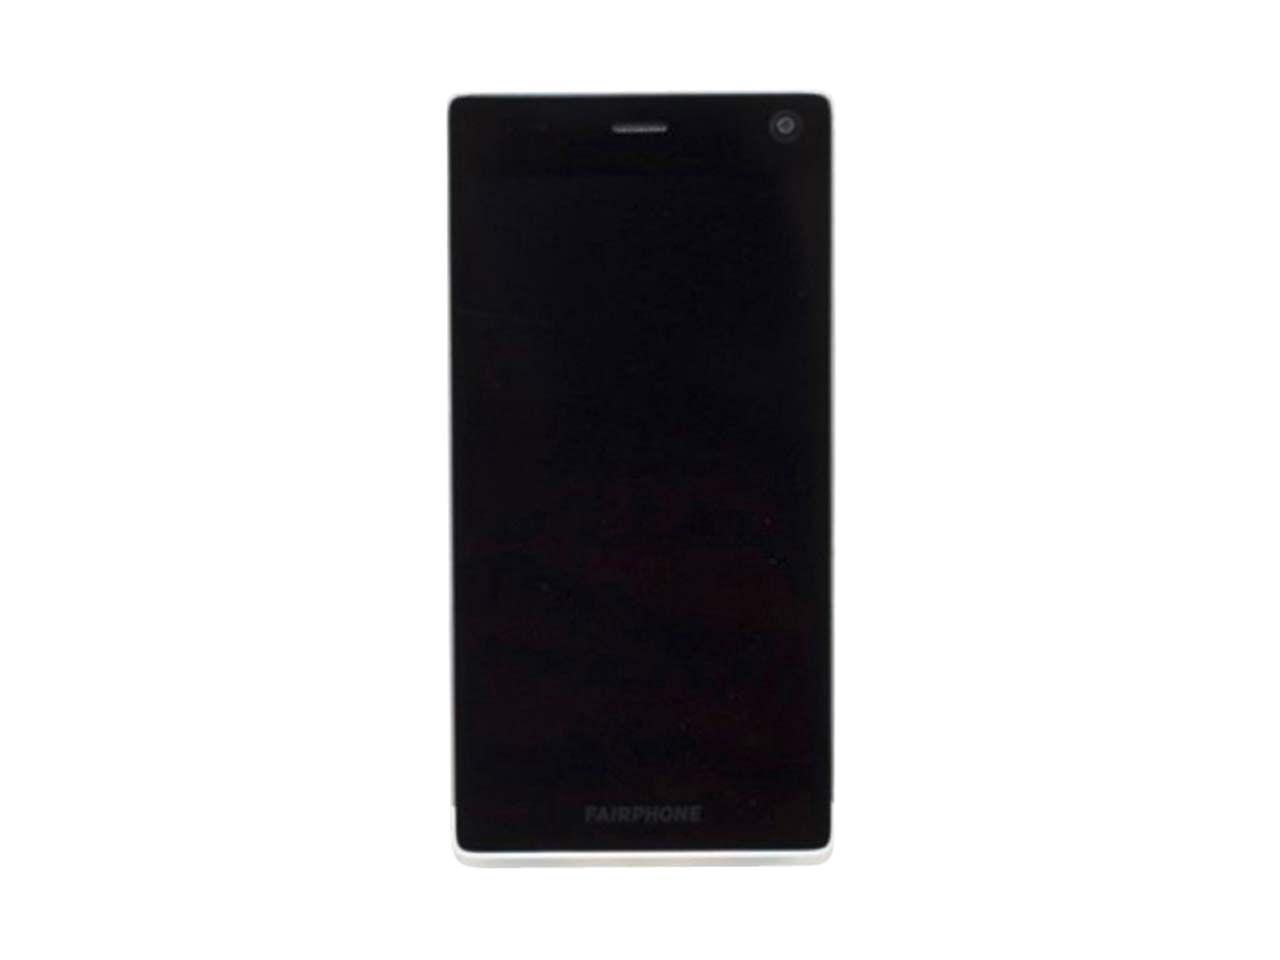 Ersatzdisplay für Fairphone 2 8FP21DISP01-01A